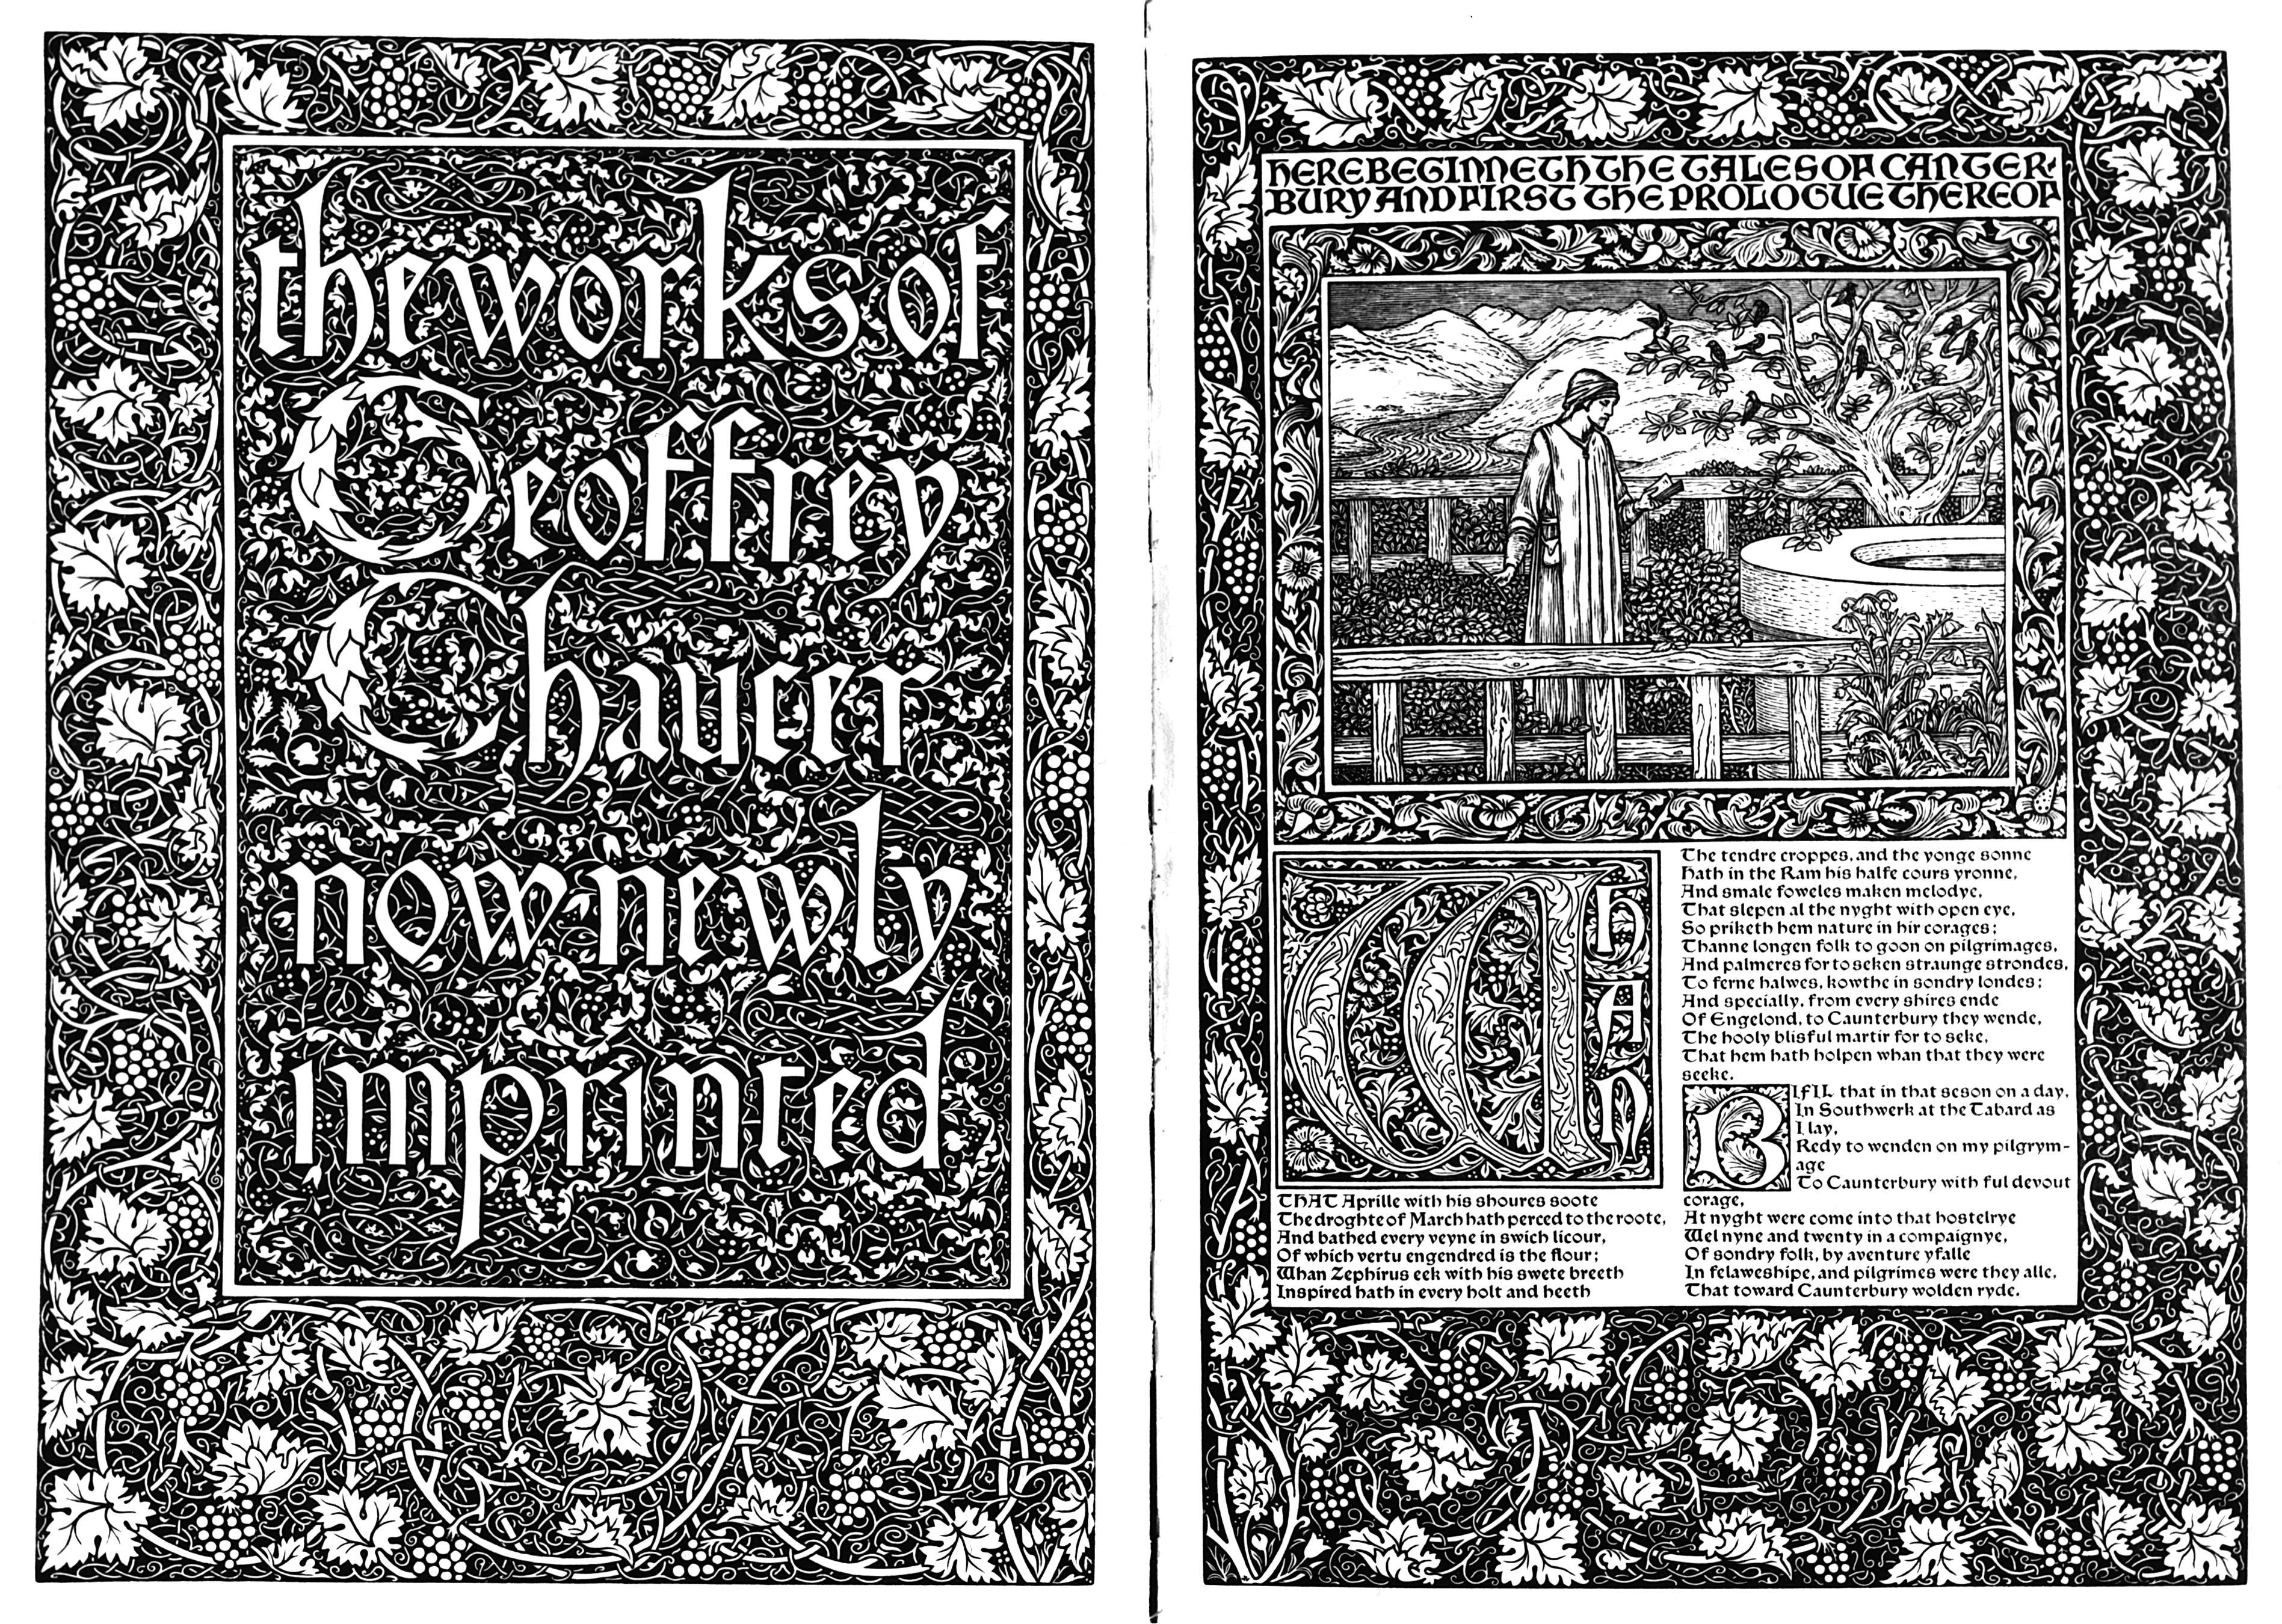 http://blogs.princeton.edu/rarebooks/images/K-C-title.page.jpg